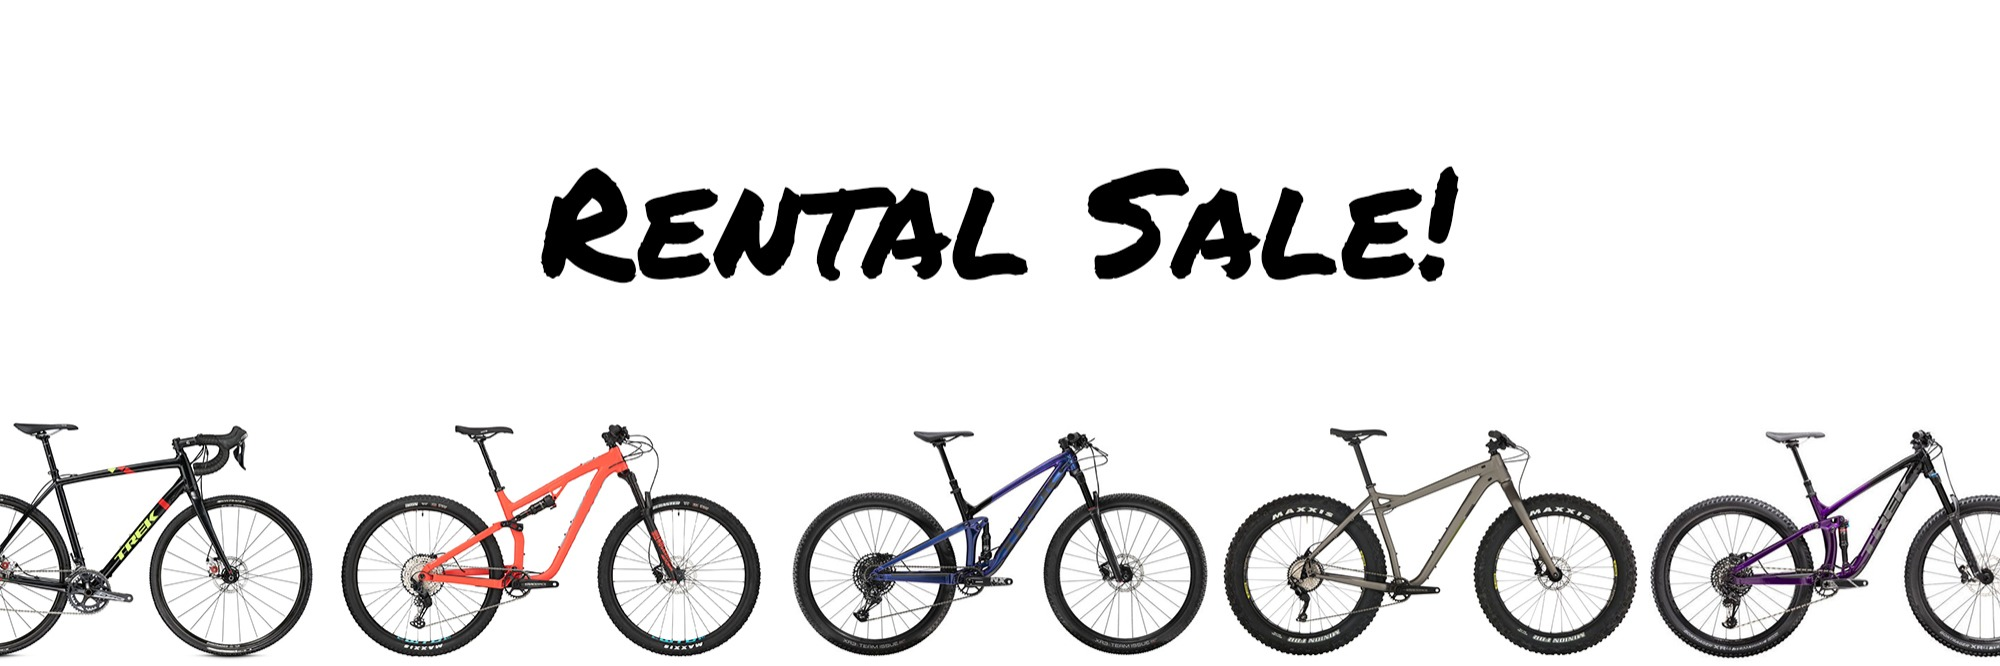 Rental Sale!